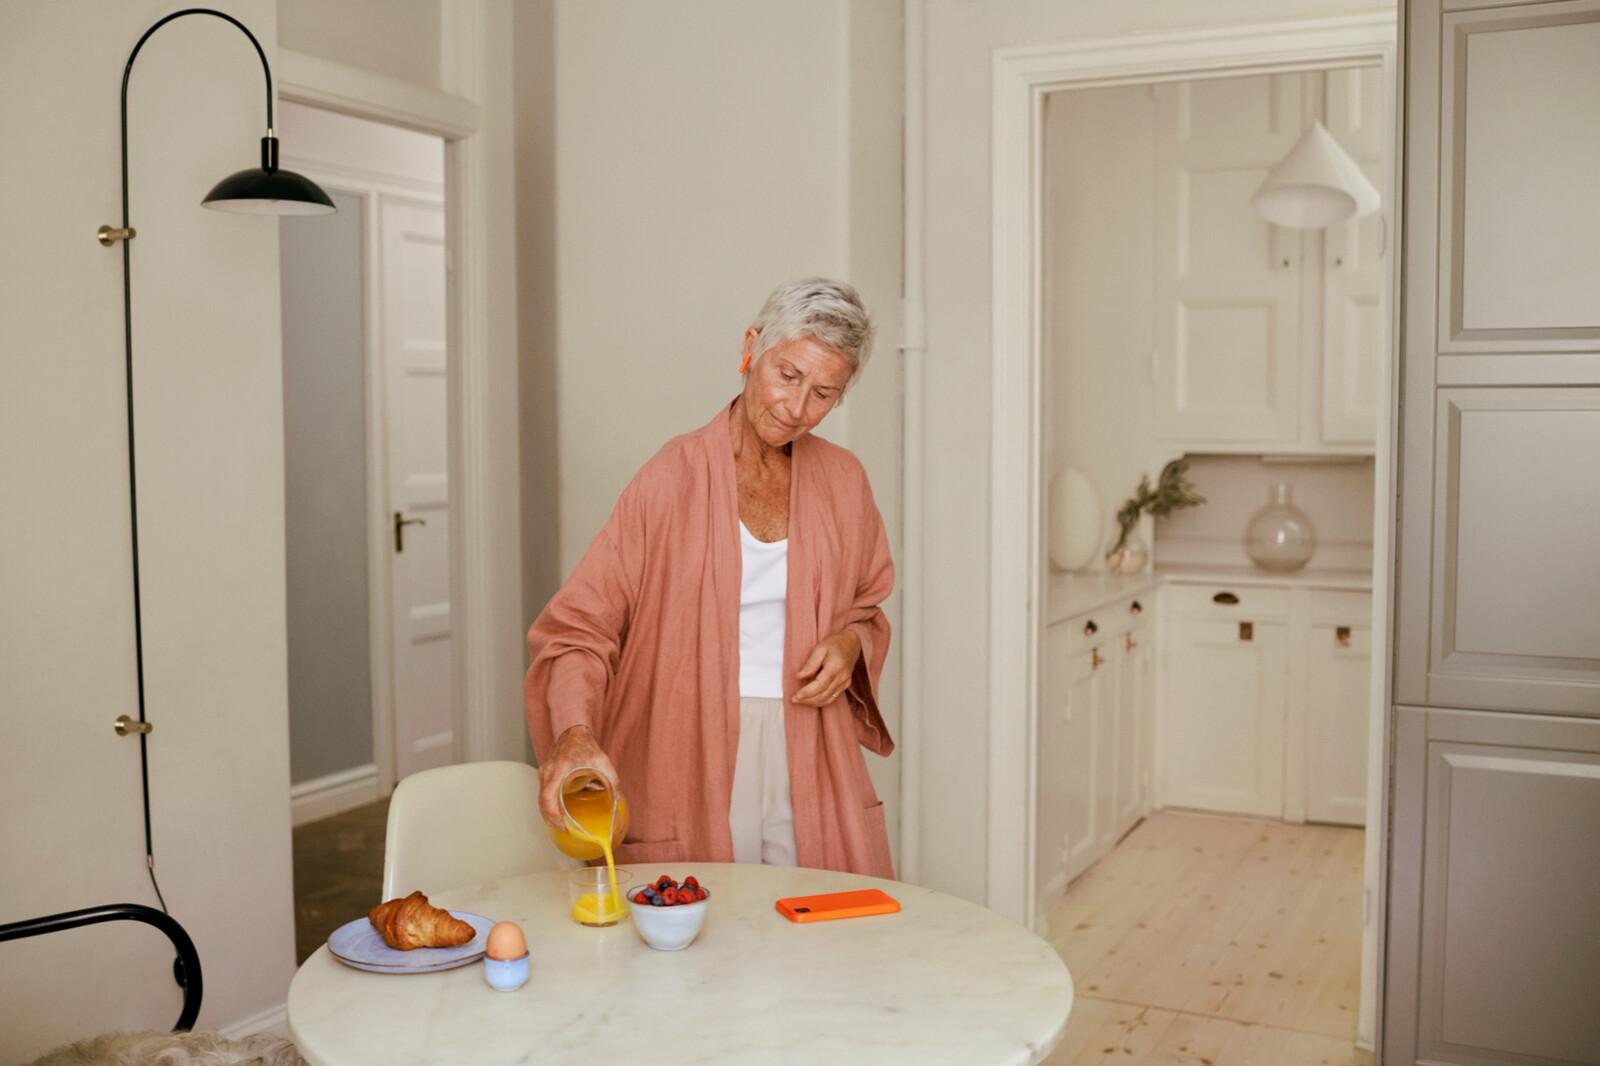 UseCaseImagery2021 Europe Grandma Kitchen